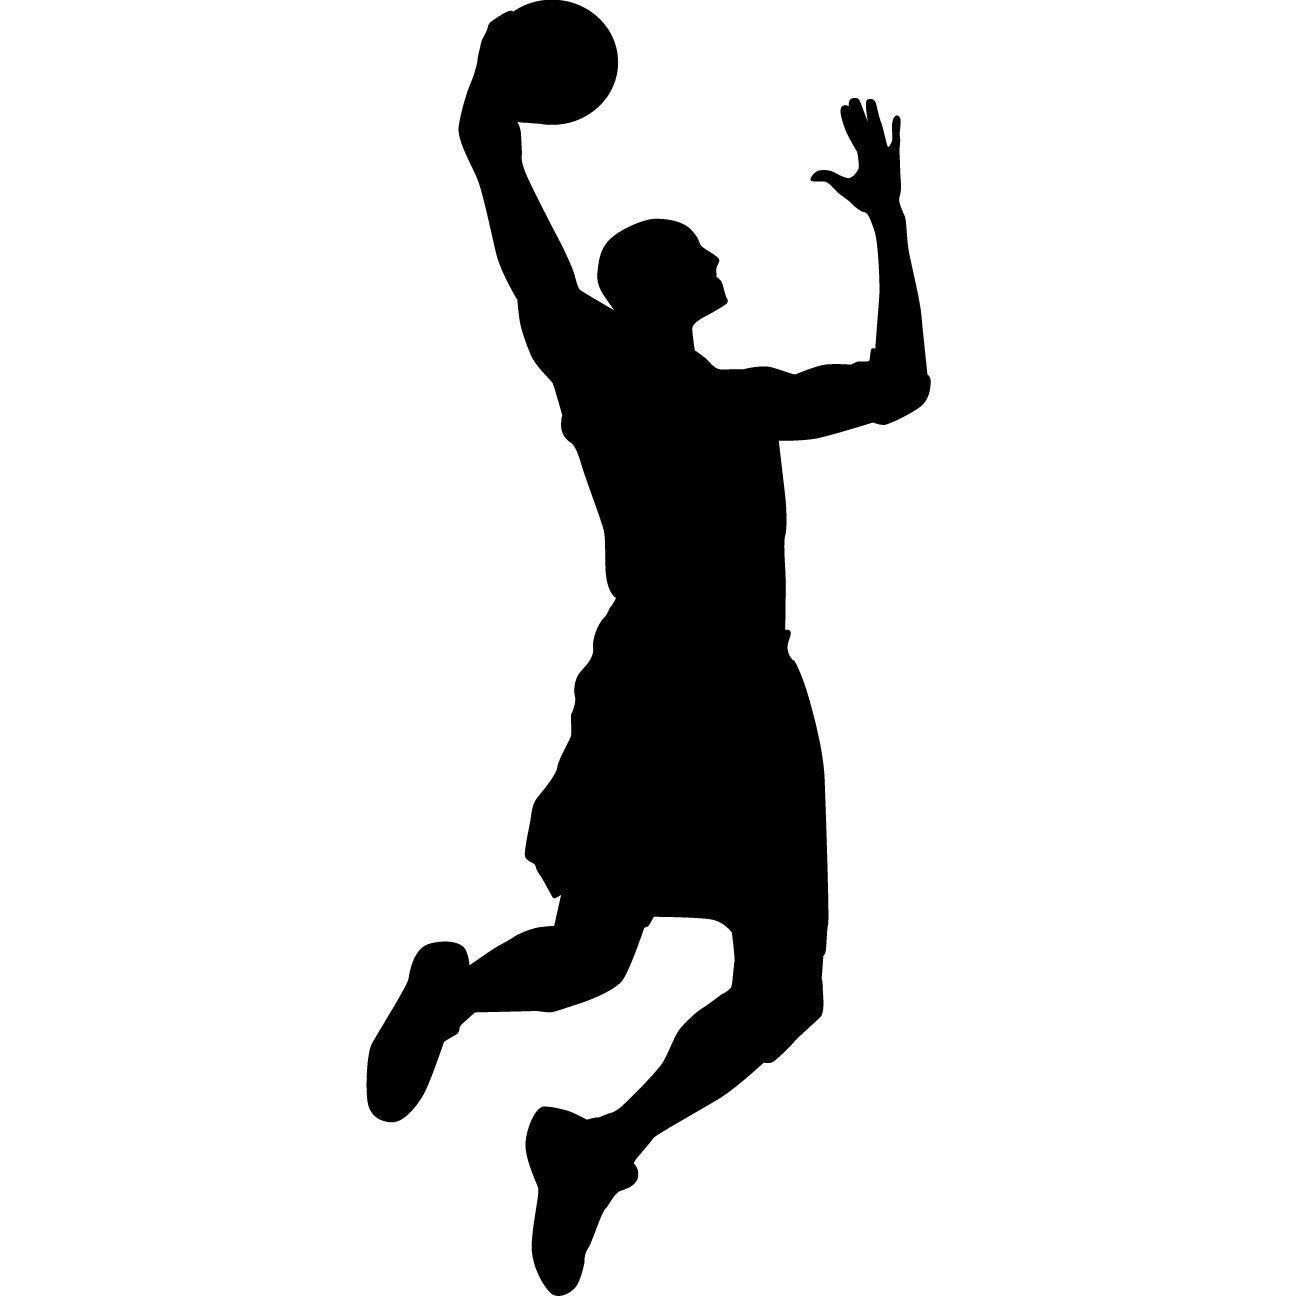 1296x1296 Basketball Silhouette